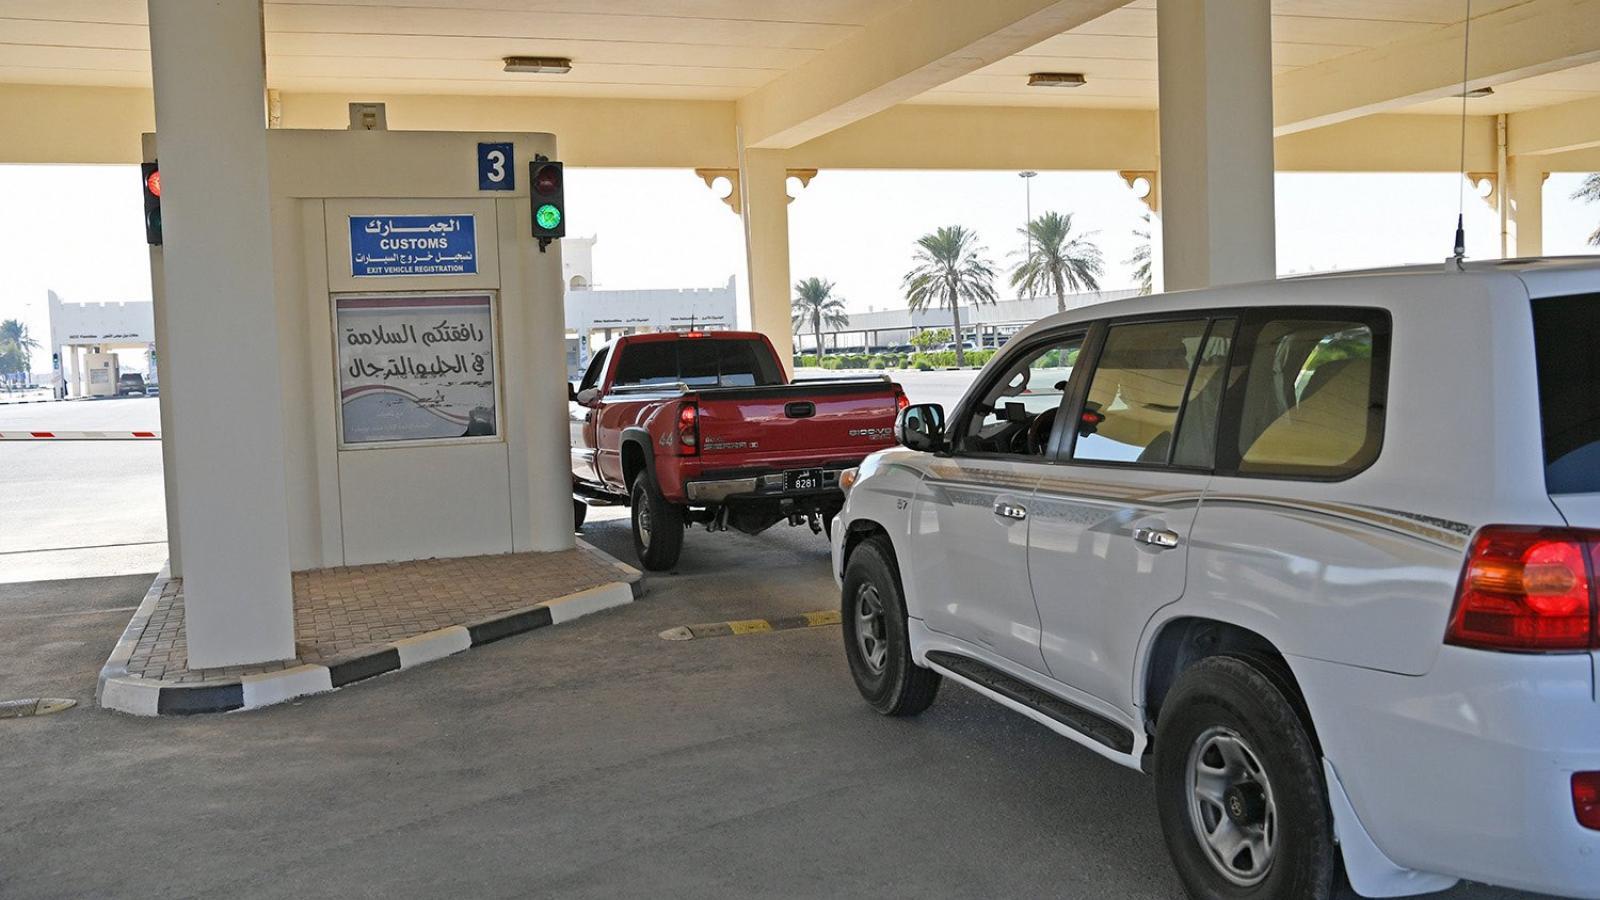 Over 900 vehicles cross Abu Samra border in three days: Qatar Customs